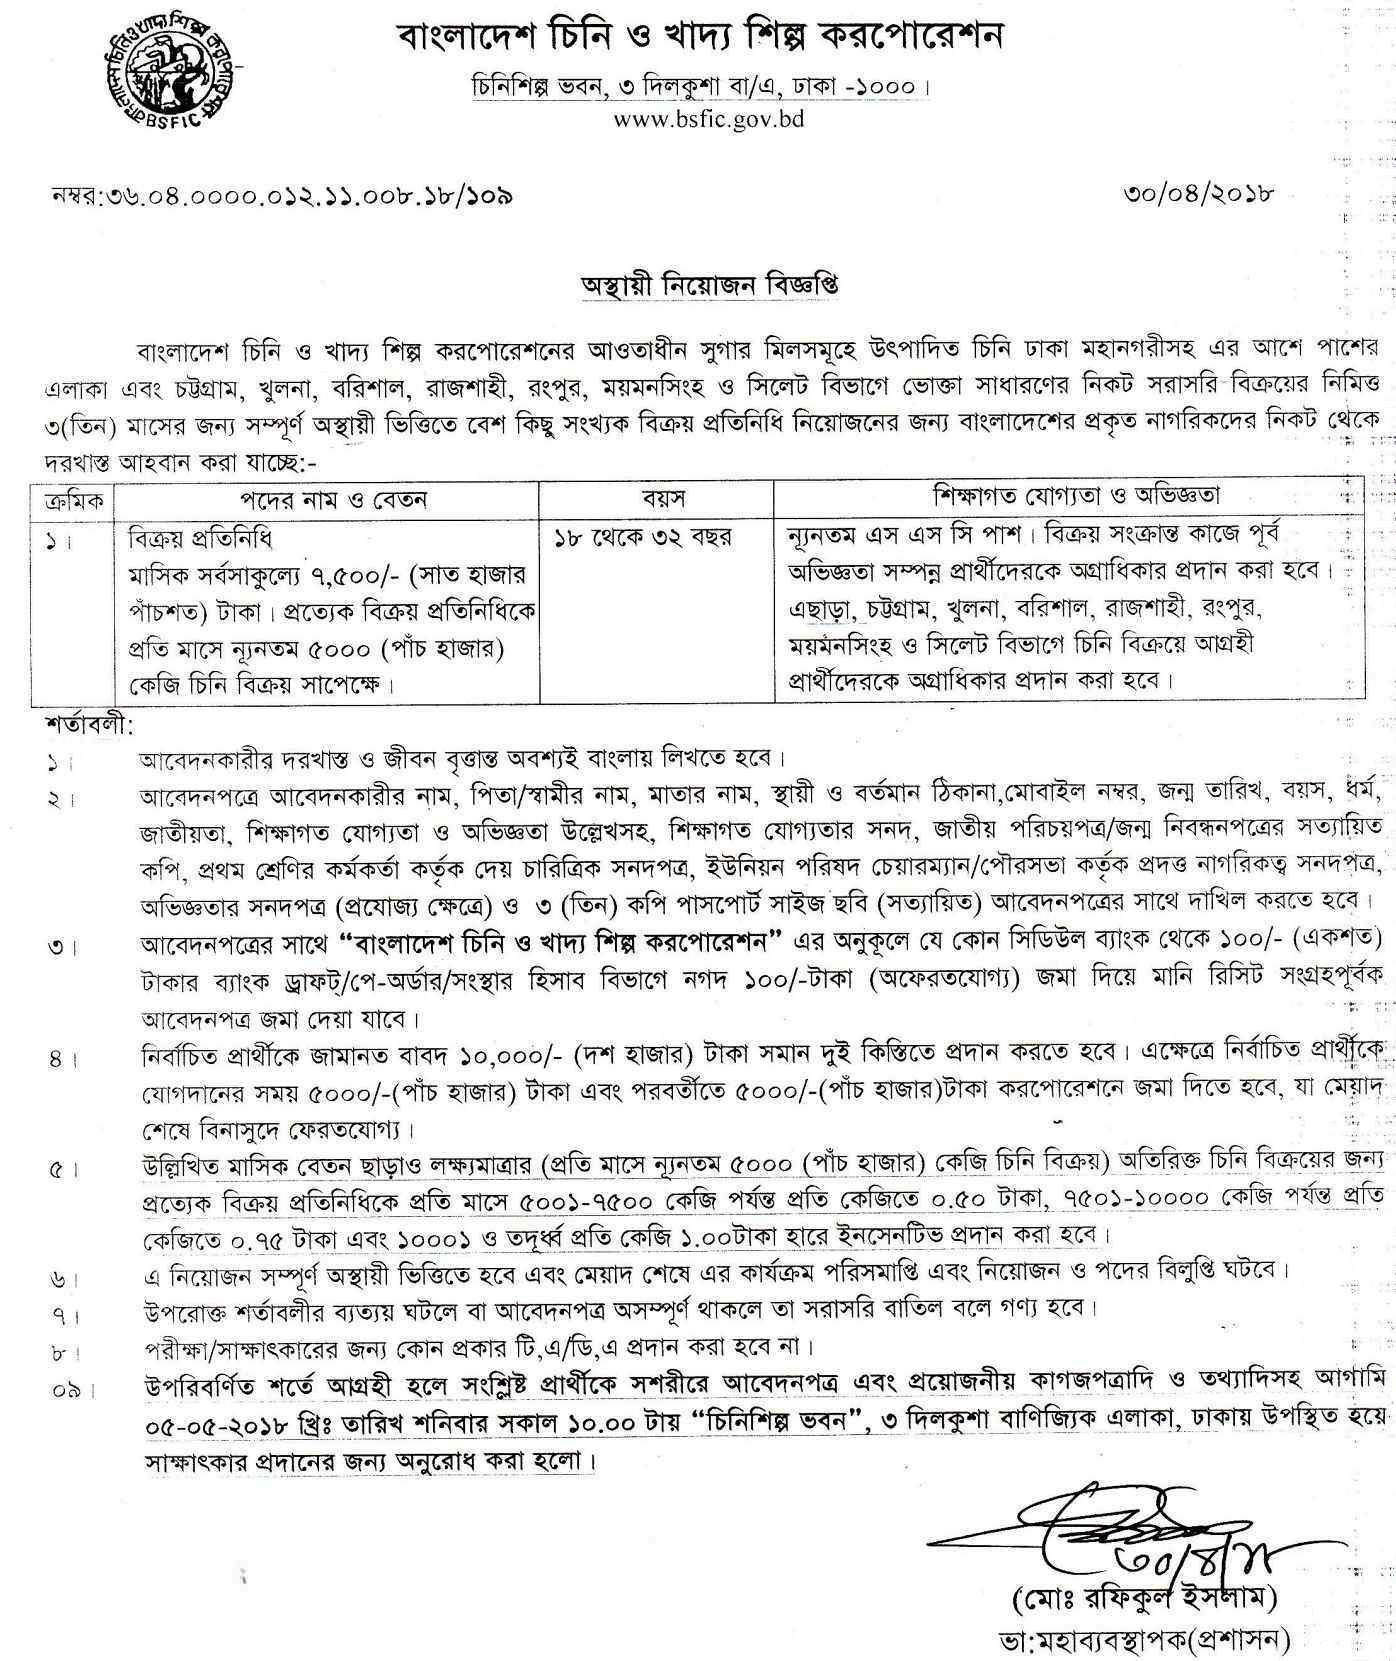 Bangladesh Sugar & Food Industries Corporation BSFIC Job